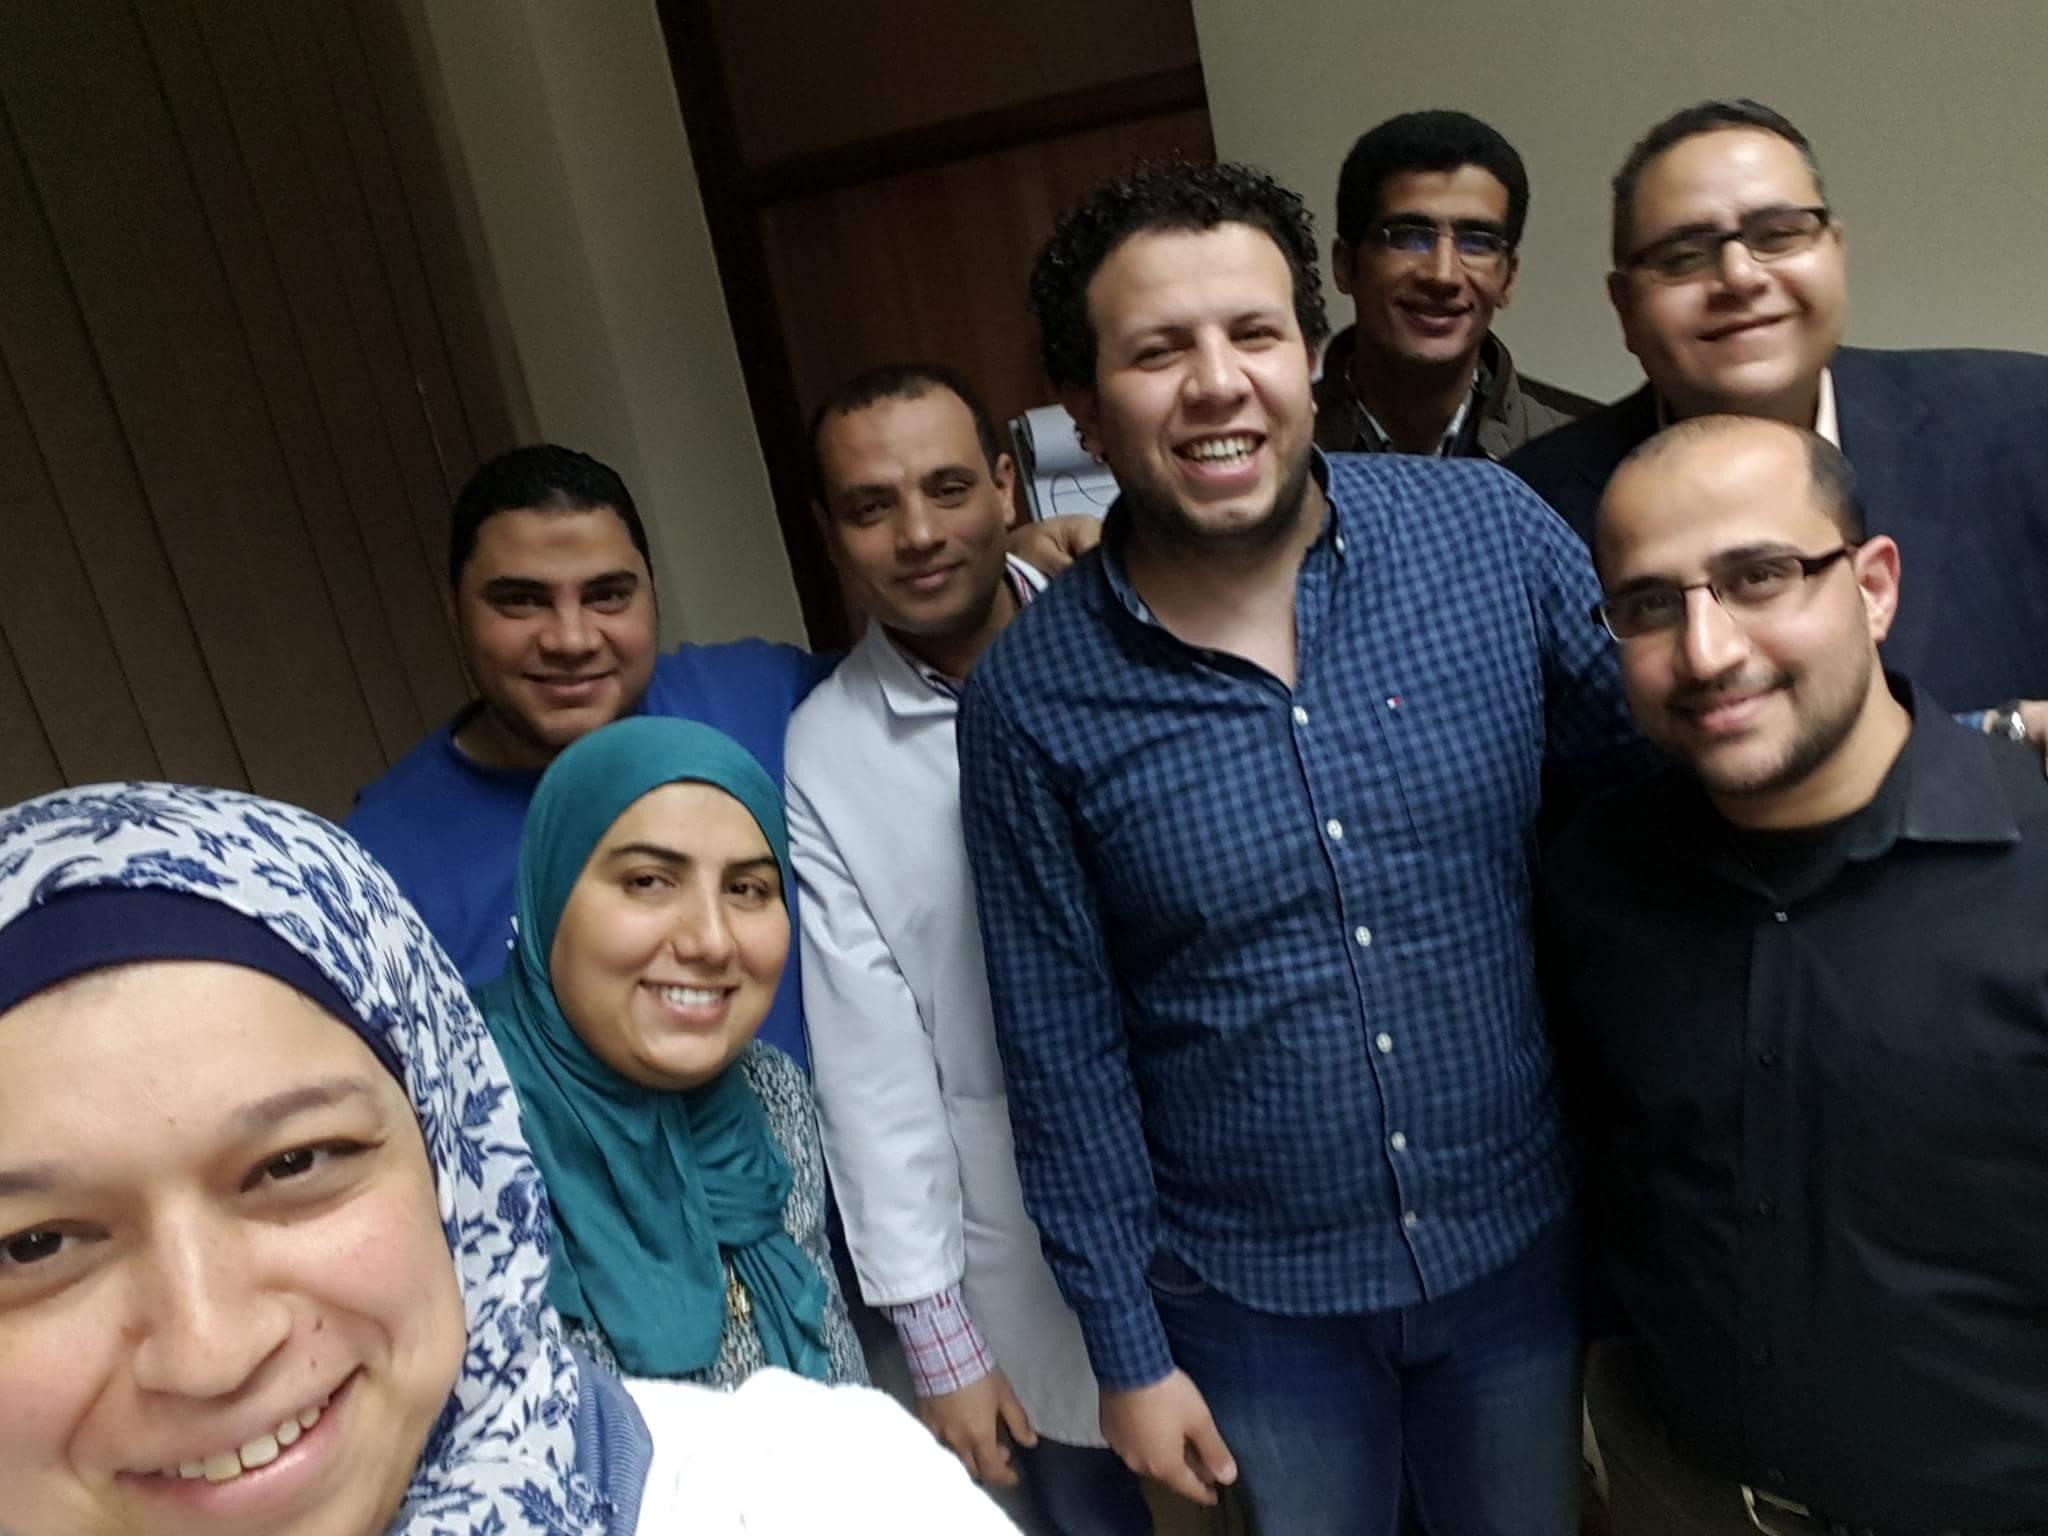 Excellence Center Egypt20160331-received_1079530448736363.jpeg .jpg